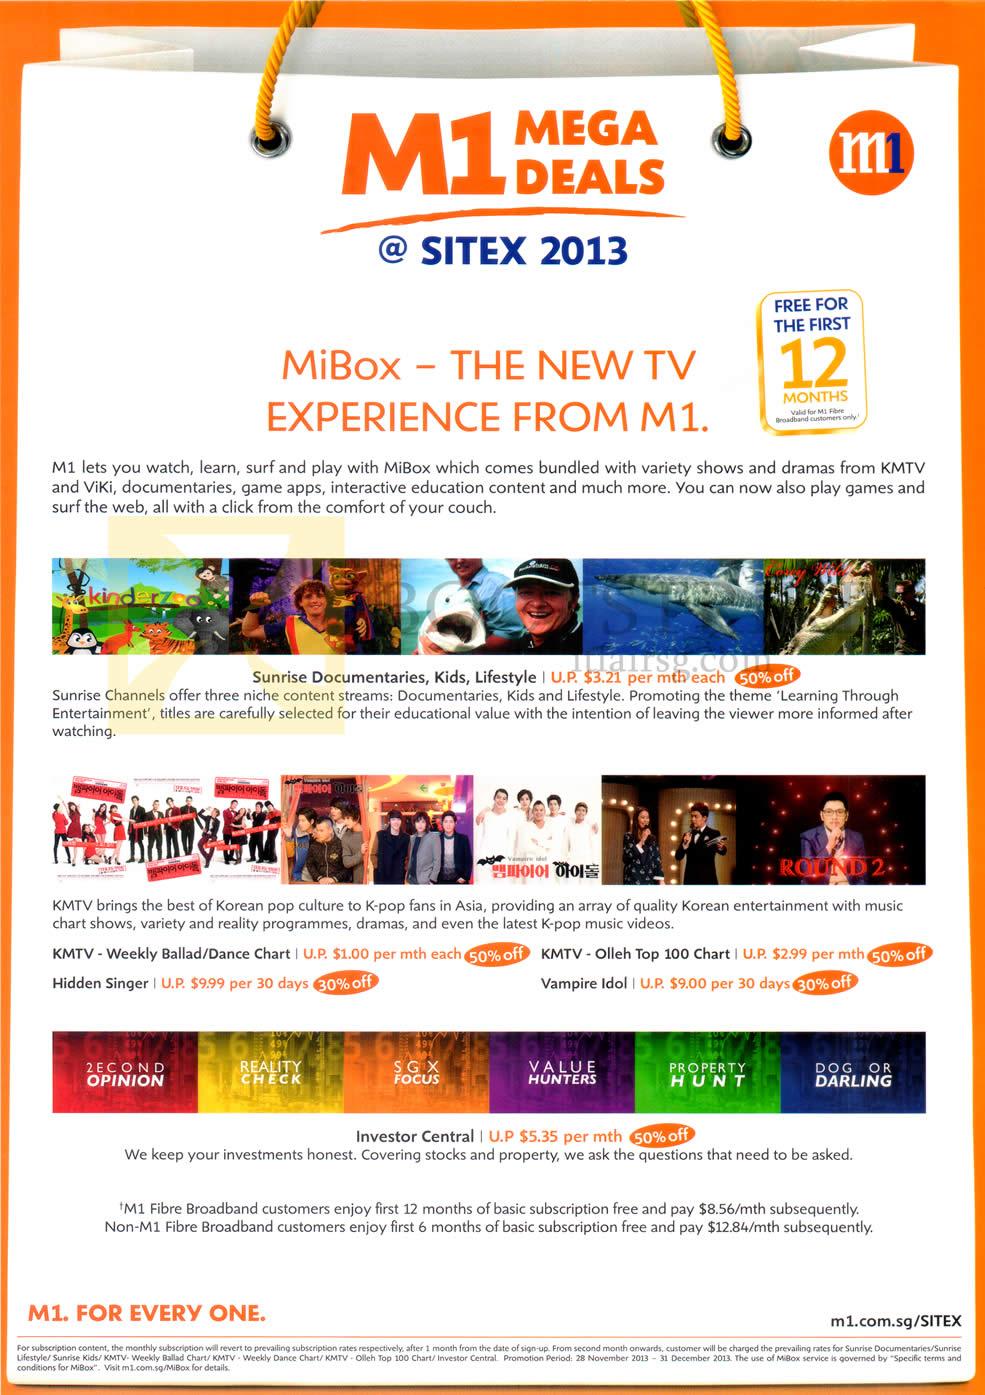 m1 tv mibox sitex 2013 price list brochure flyer image. Black Bedroom Furniture Sets. Home Design Ideas